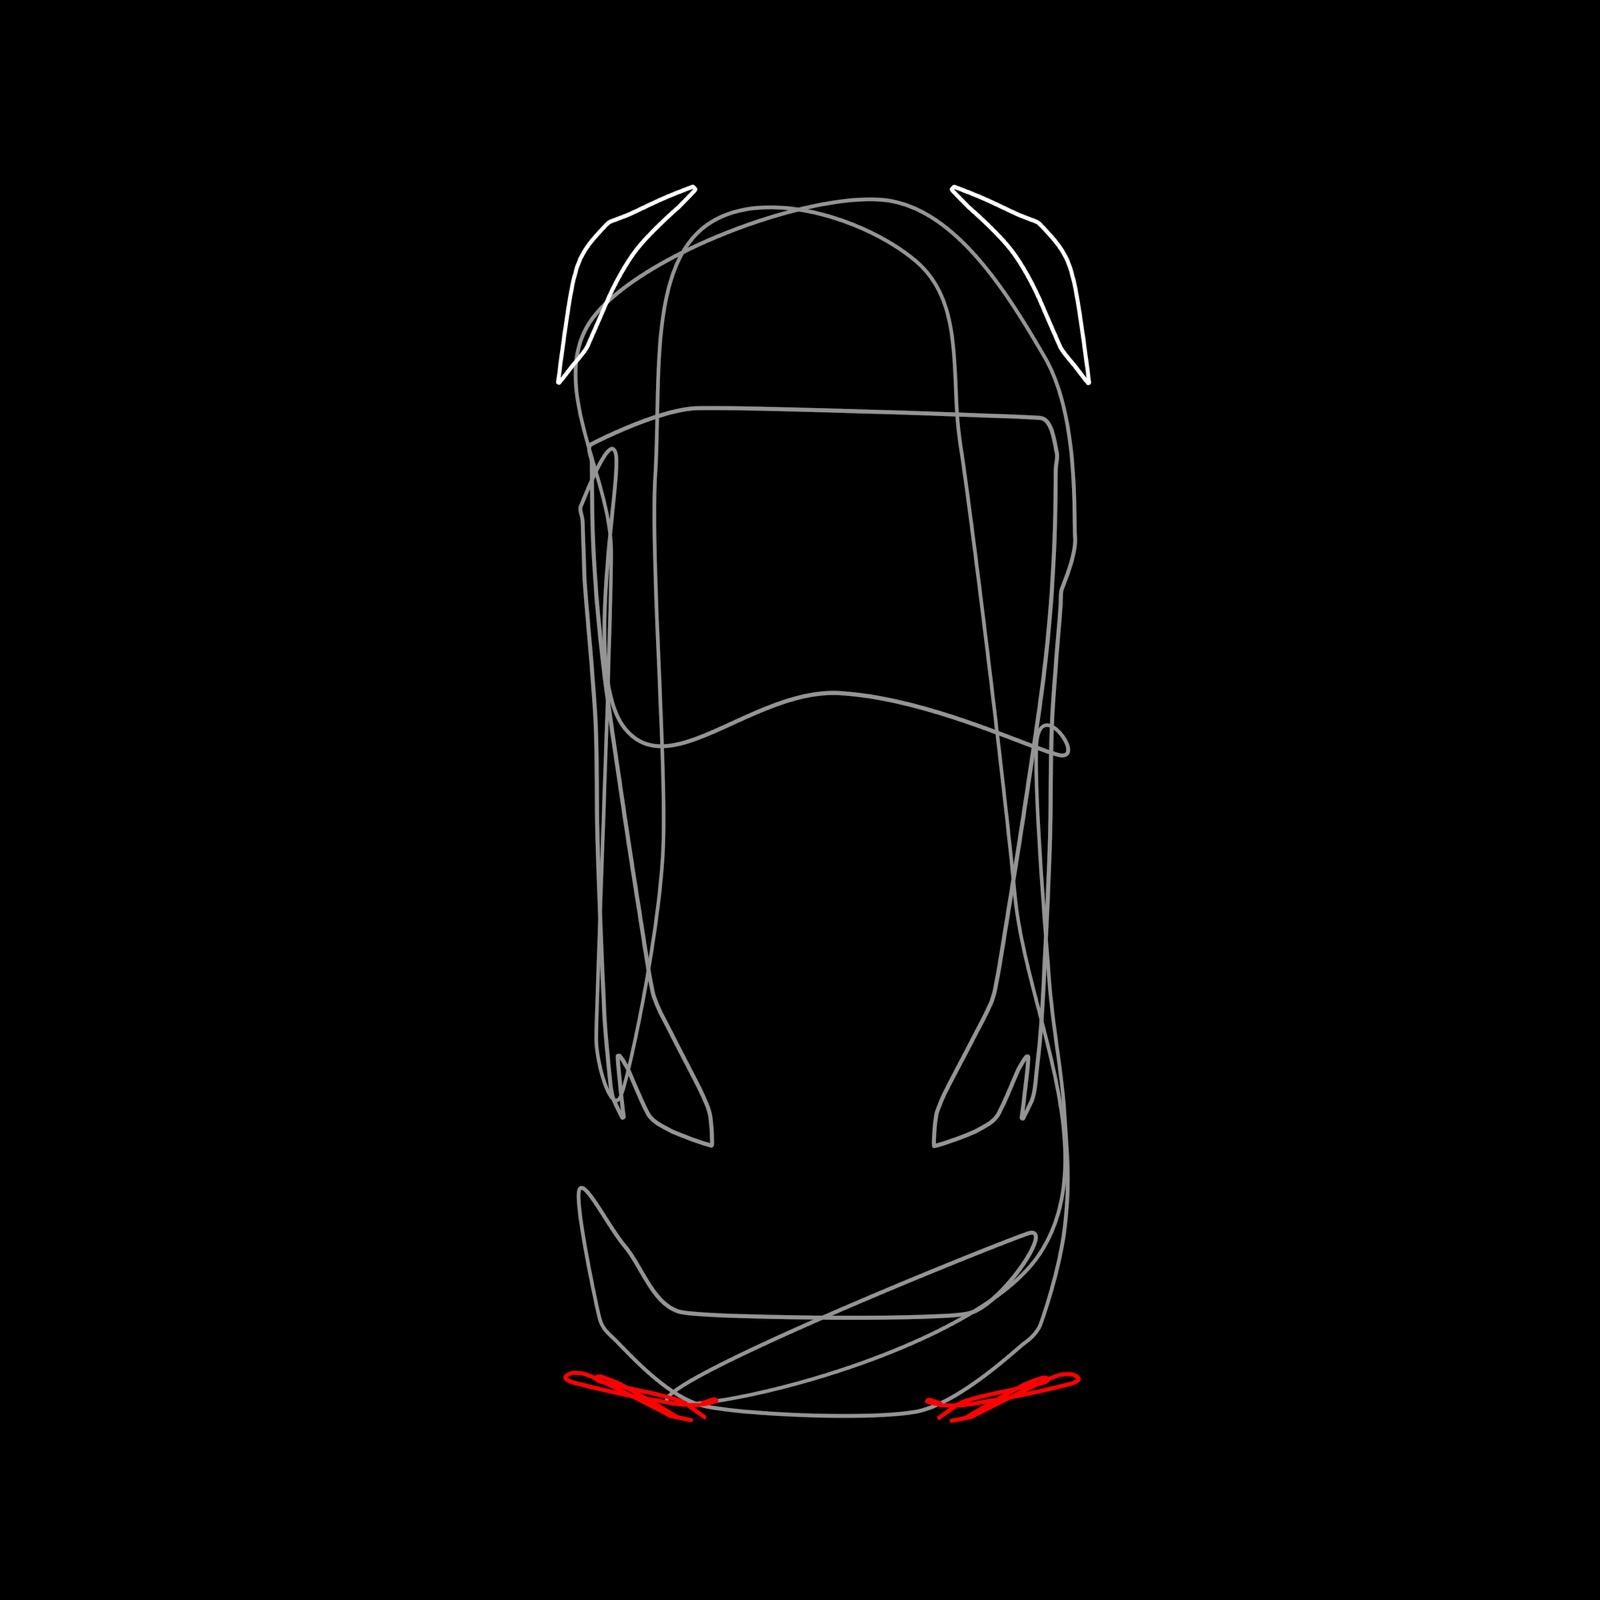 car_sketch_02